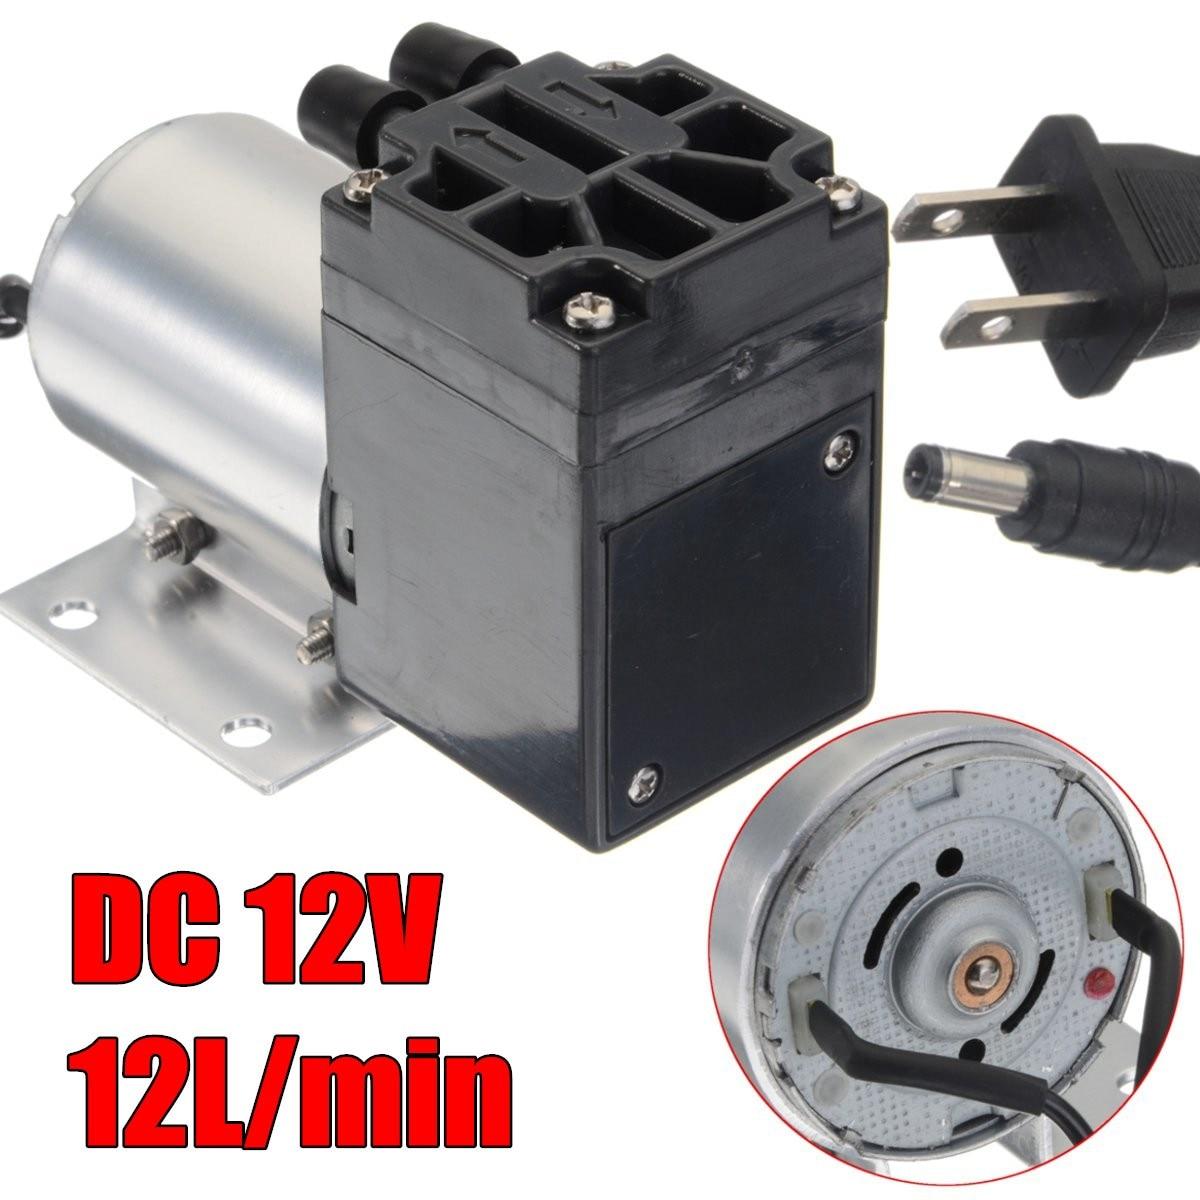 DC 12V mini vacuum pump Negative pressure suction suction pump 12L/min 120kpa 1pcs 12v anti corrosion vacuum pump mini 0 400 ml min self suction peristaltic pump